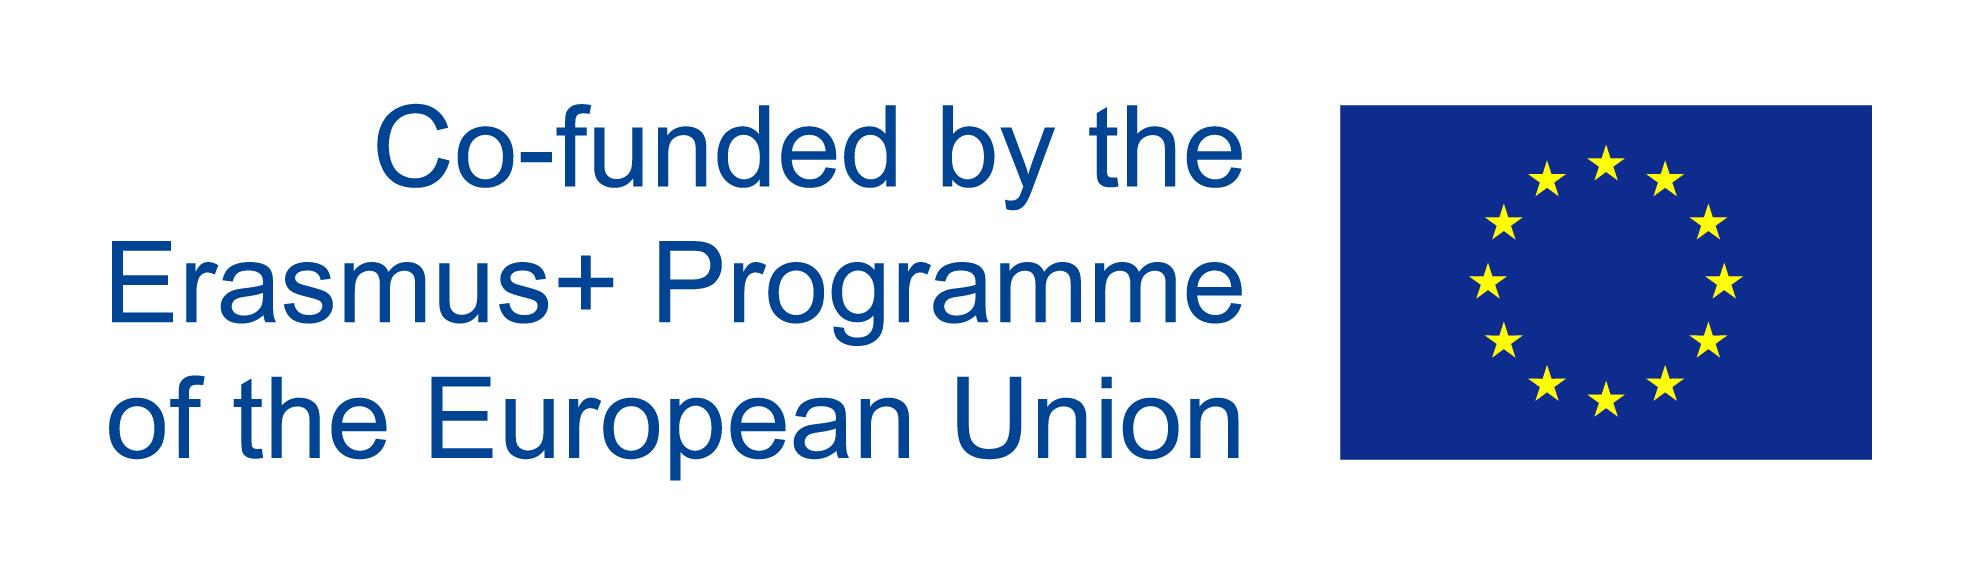 eu_flag_co_funded_pos_[rgb]_left.jpg